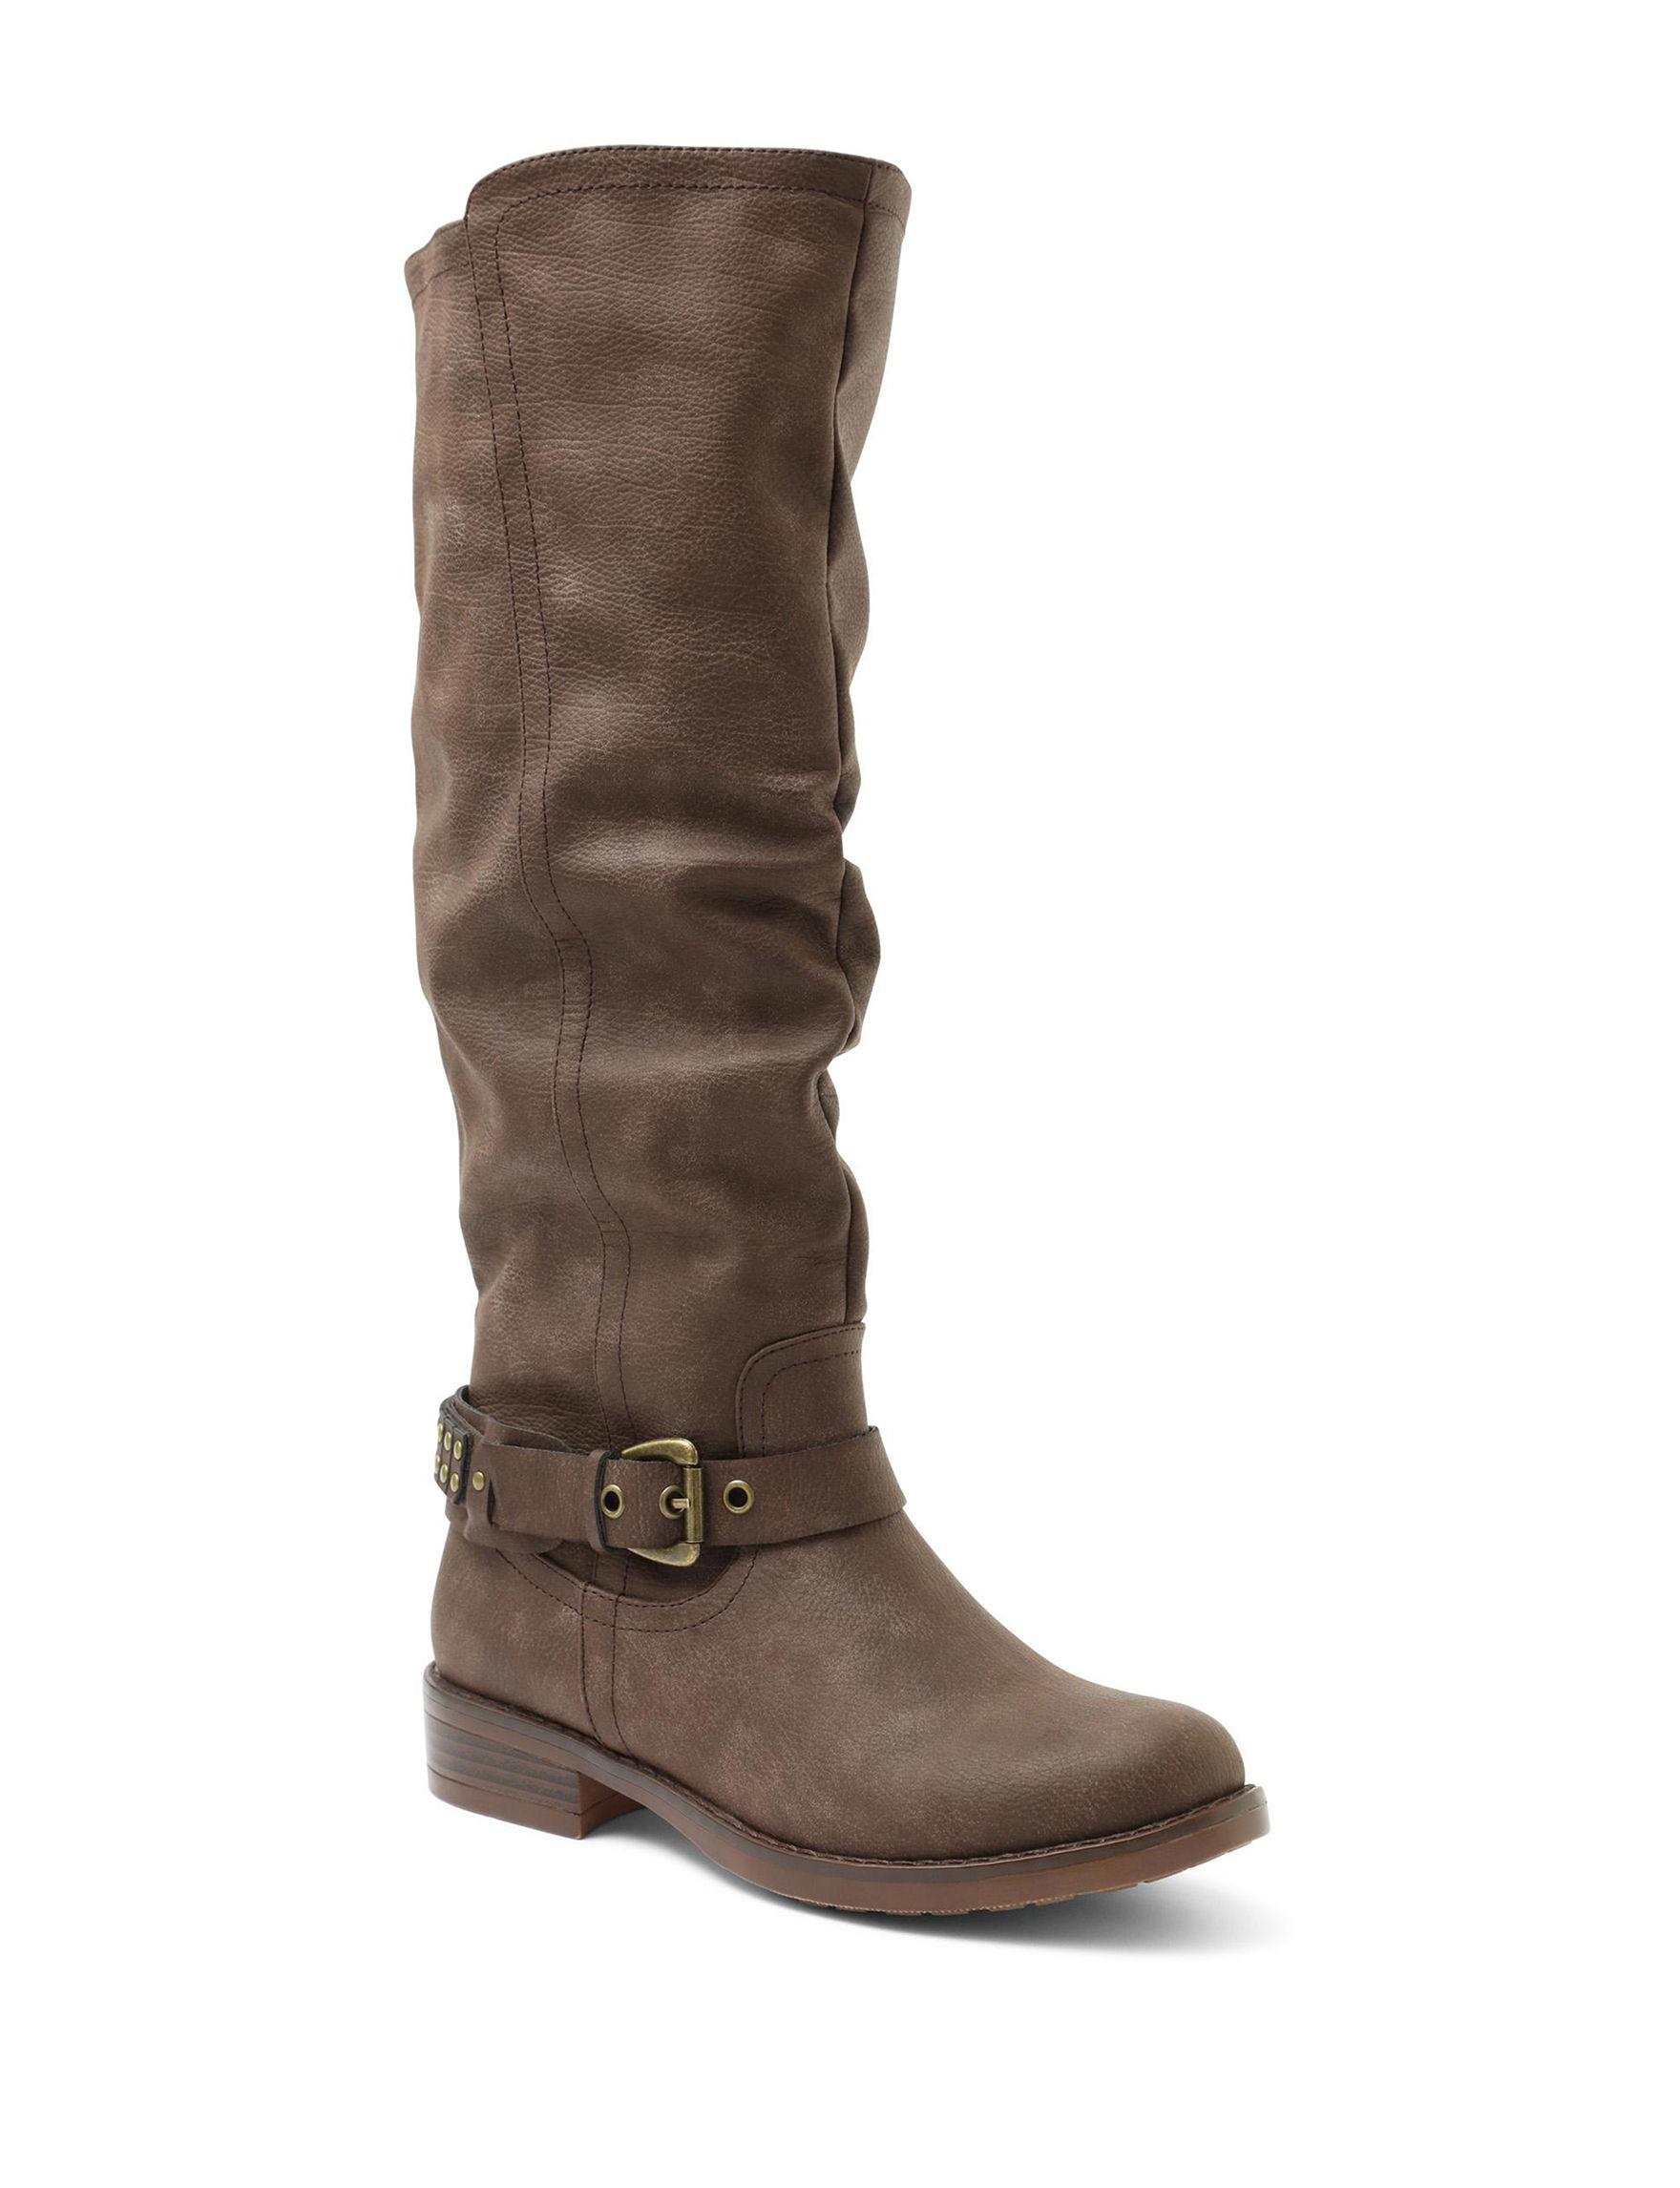 XOXO Brown Riding Boots Wide Calf